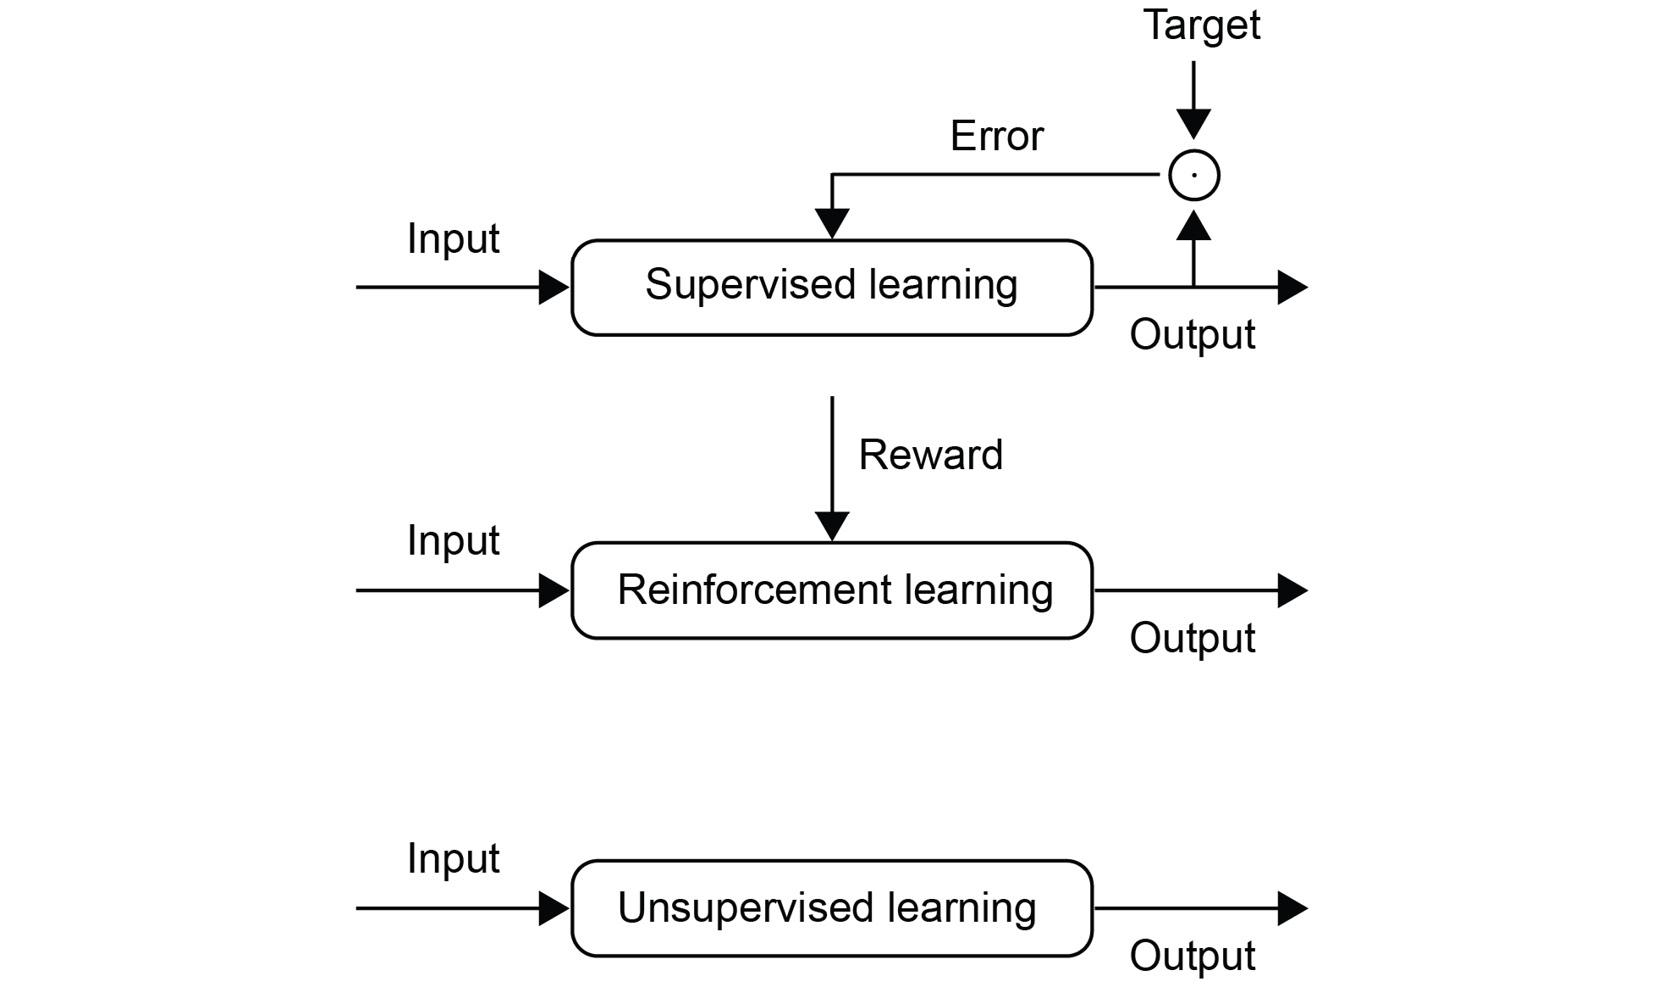 Figure 1.3: Representation of learning paradigms